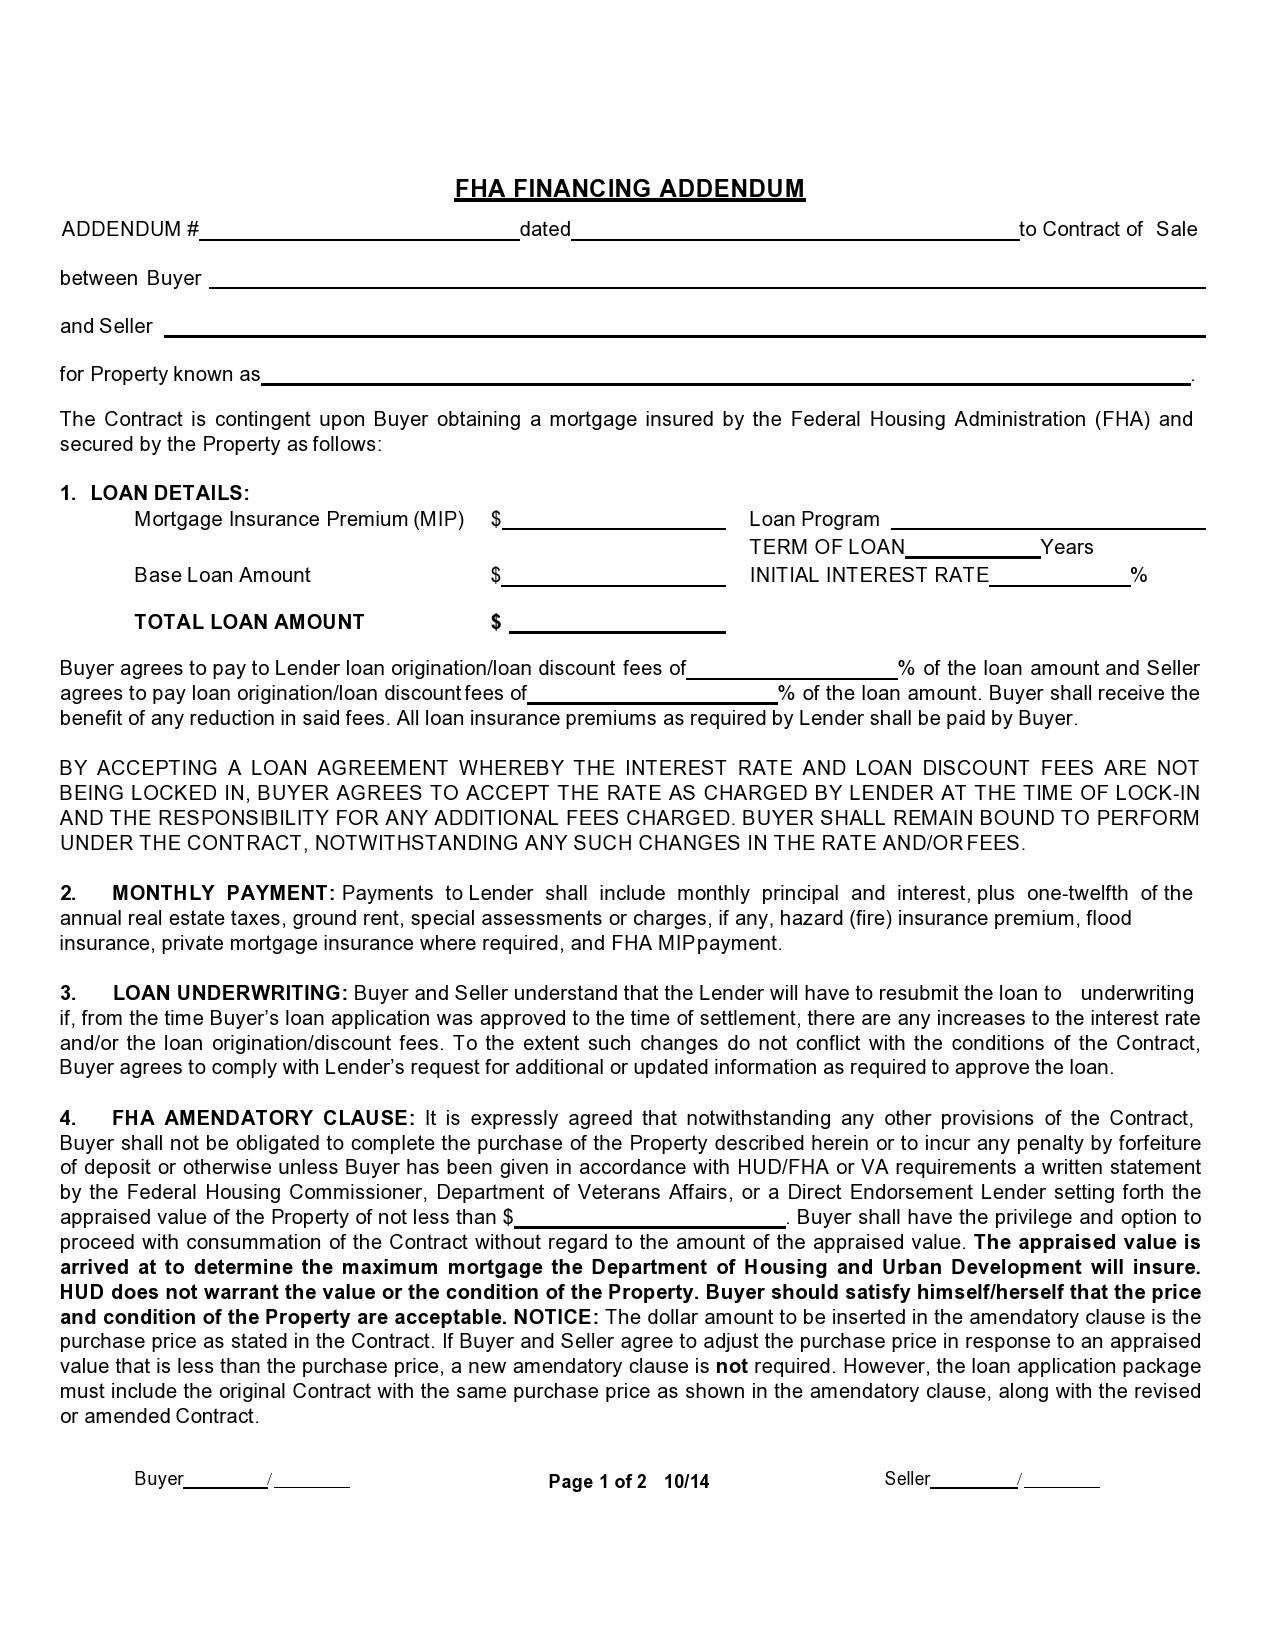 Free seller financing addendum 42